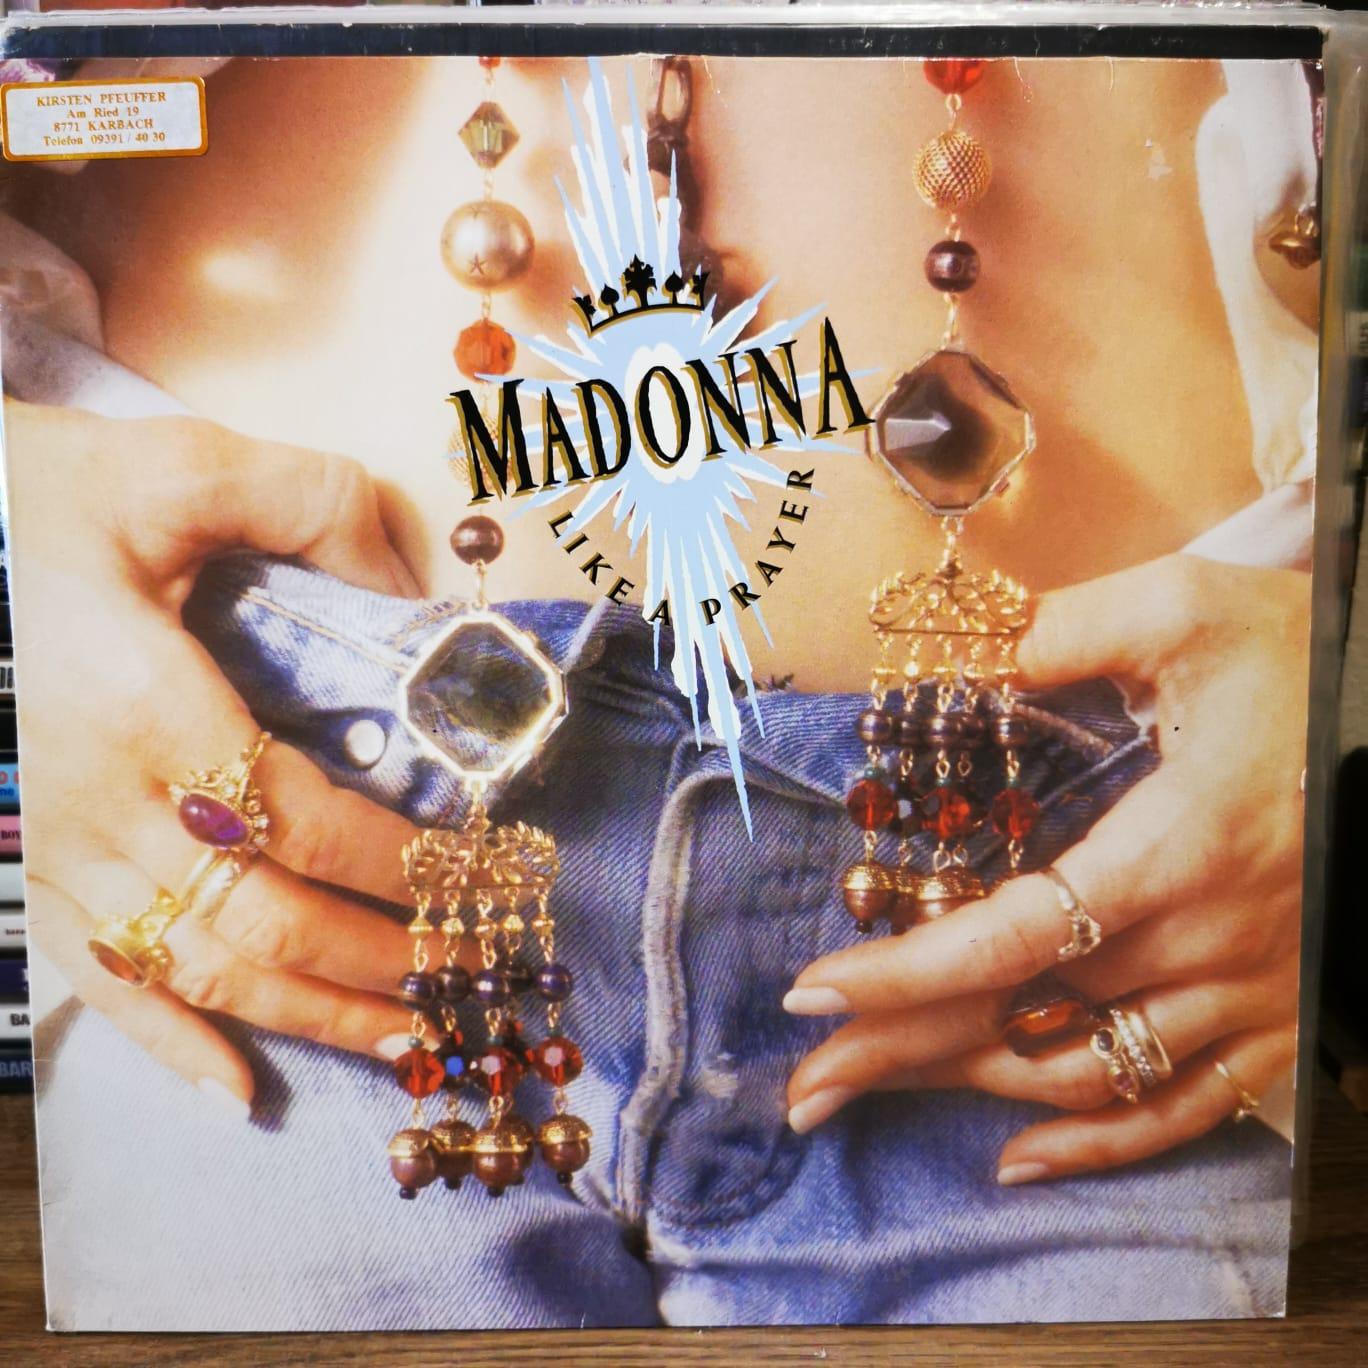 MADONNA - LIKE A PRAYER - Vinyl, LP, Album